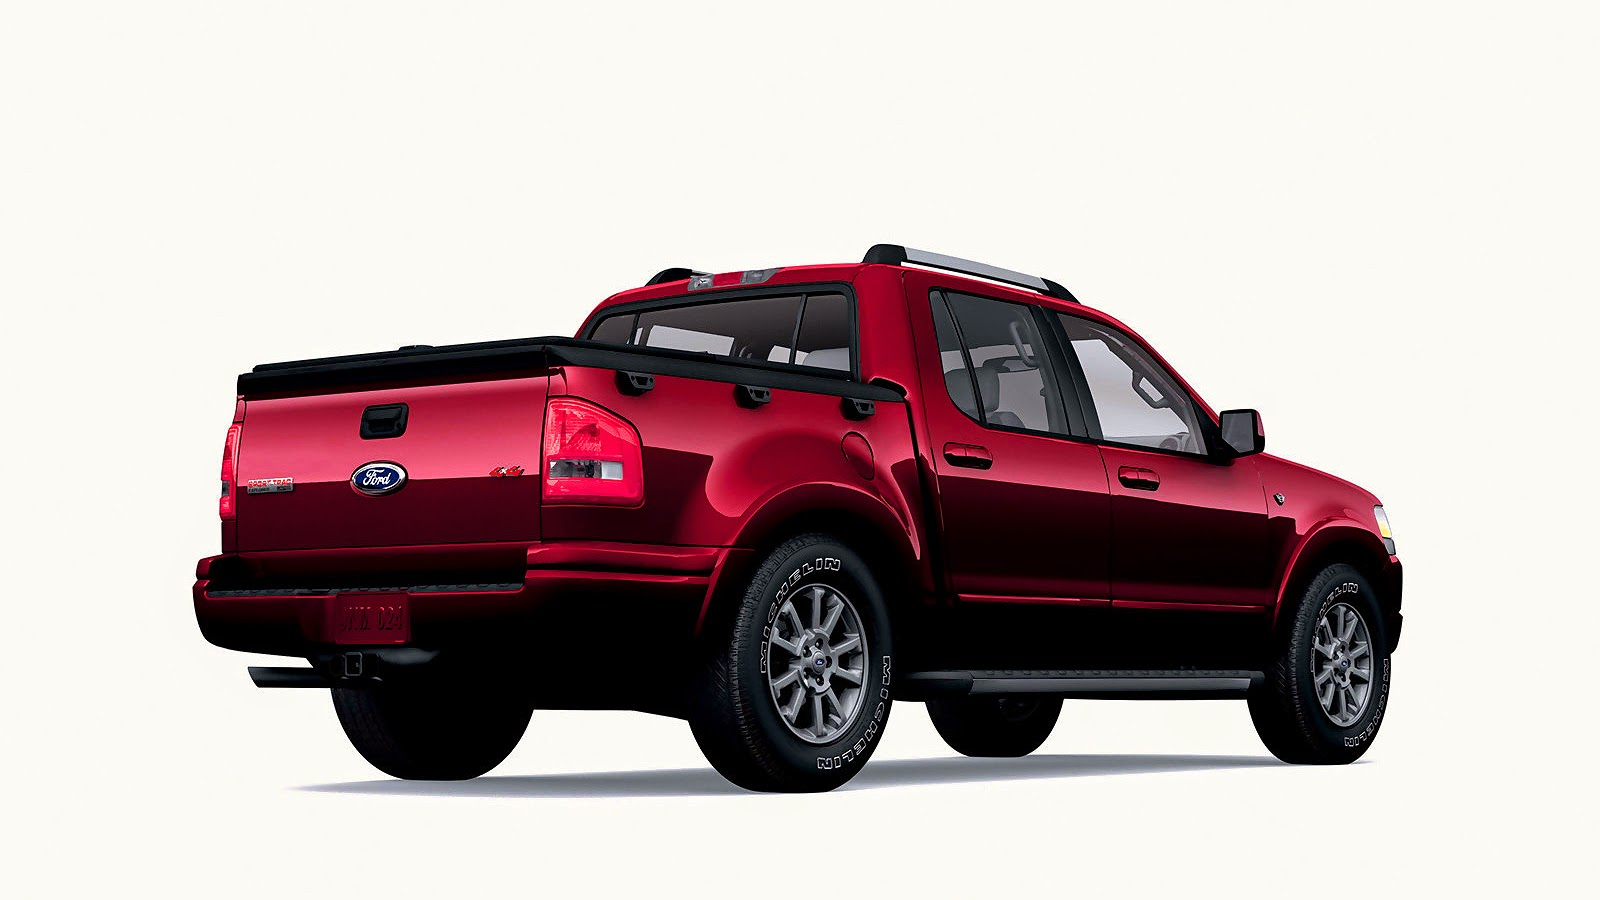 used ford explorer sport trac for sale nationwide autotrader 2017 2018 2019 ford price. Black Bedroom Furniture Sets. Home Design Ideas